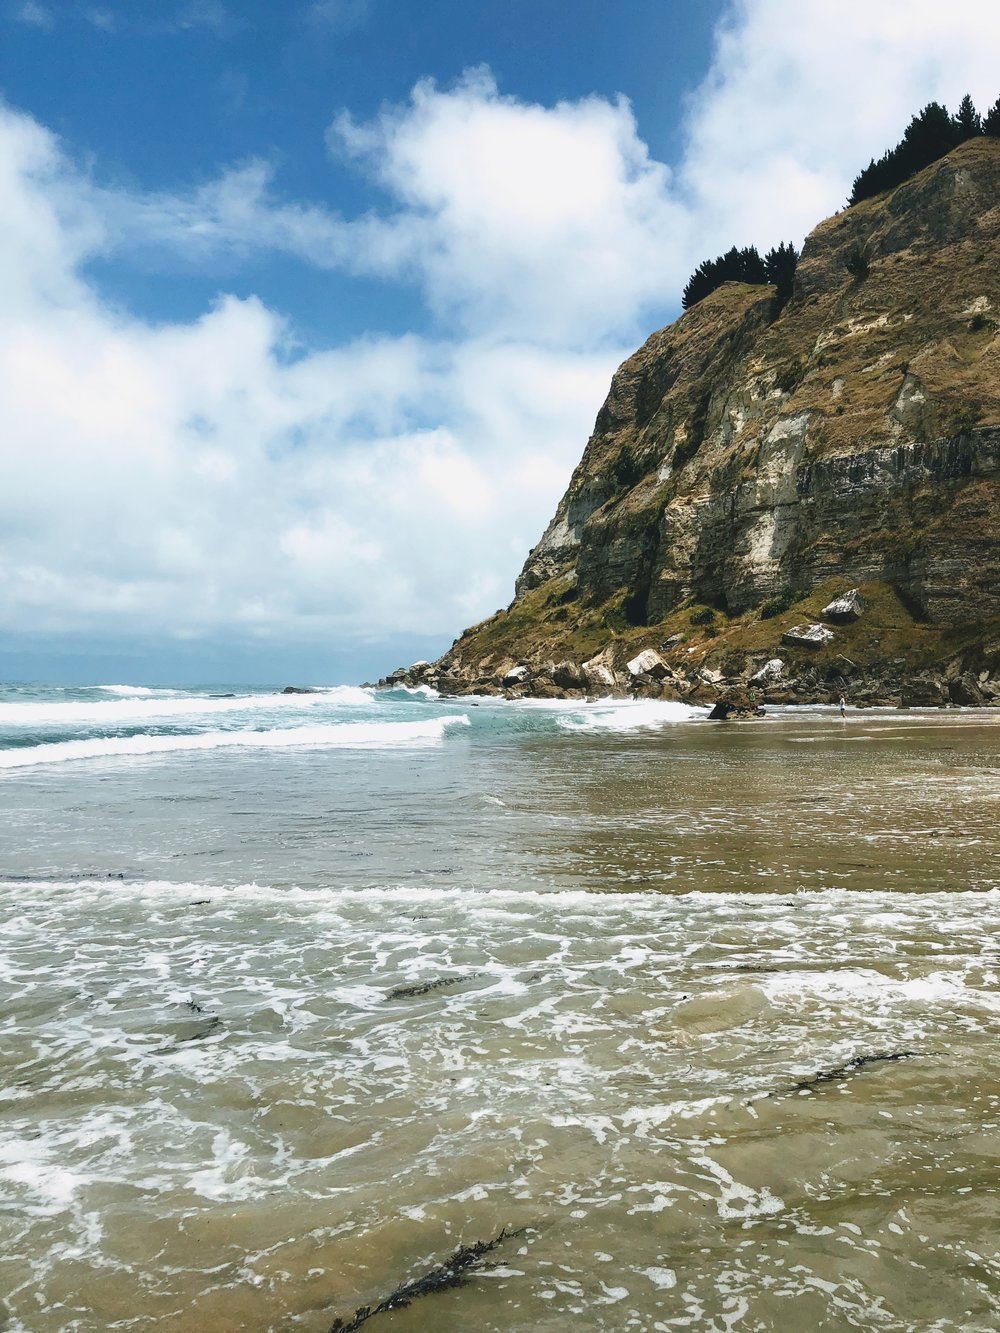 Waipatiki Beach looking towards the cliffside walk